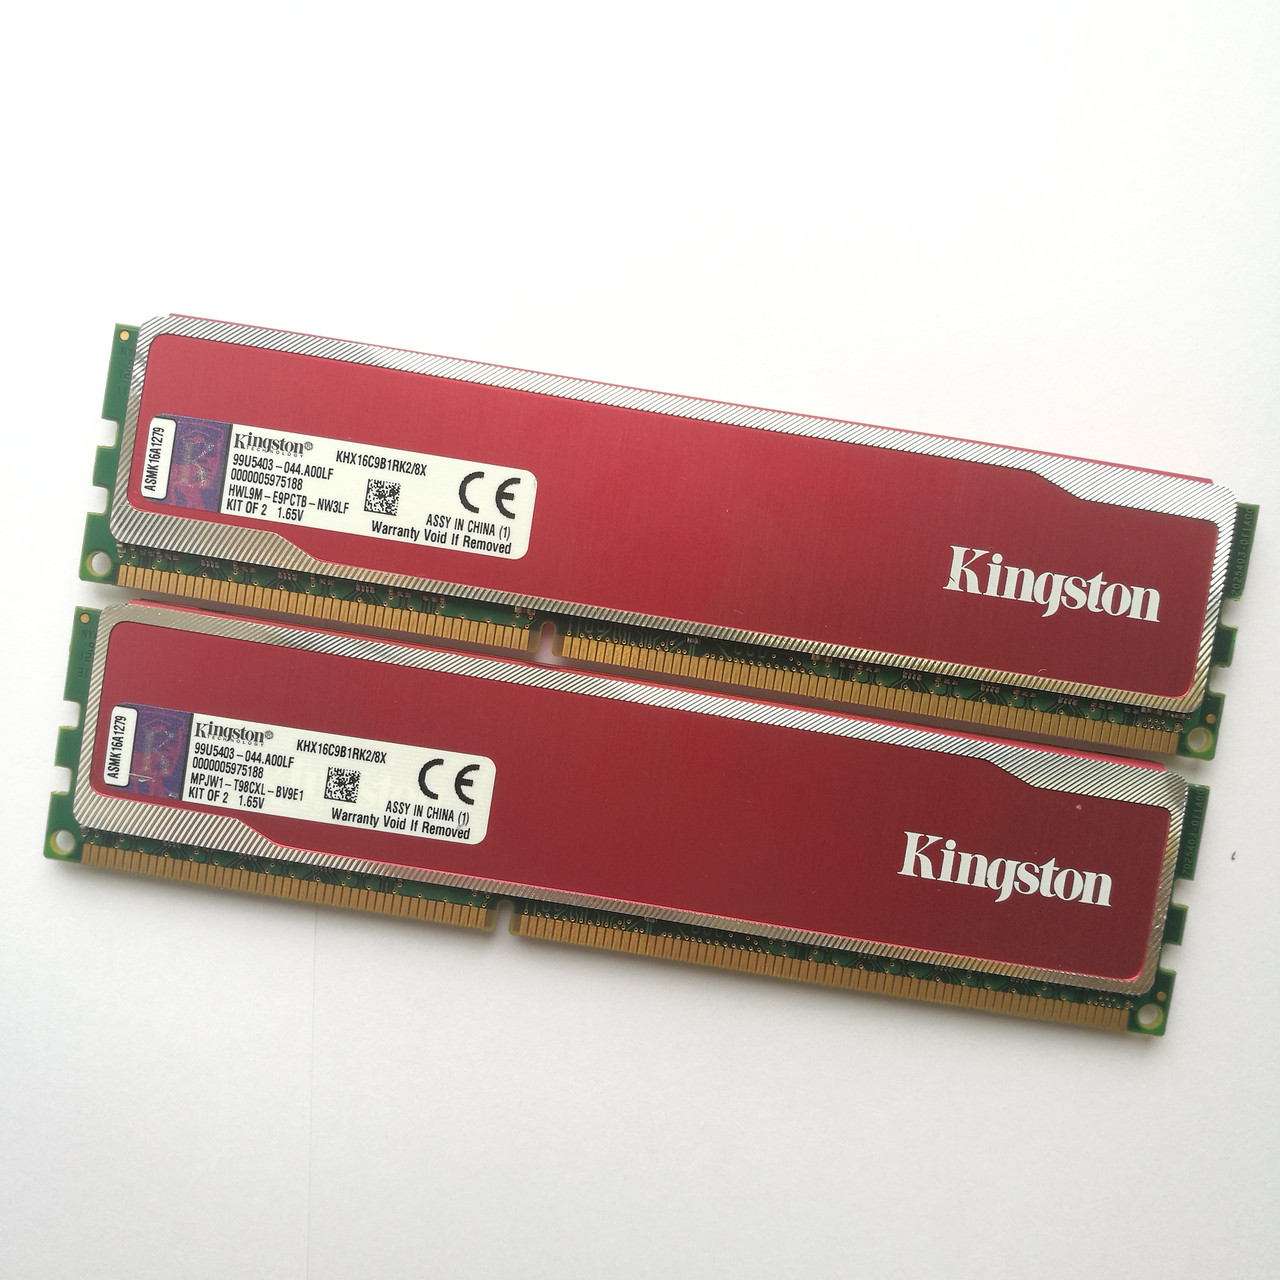 Игровая оперативная память Kingston DDR3 8Gb (2*4Gb) KIT of 2 1600MHz PC3 12800U CL9 (KHX16C9B1RK2/8X) Б/У